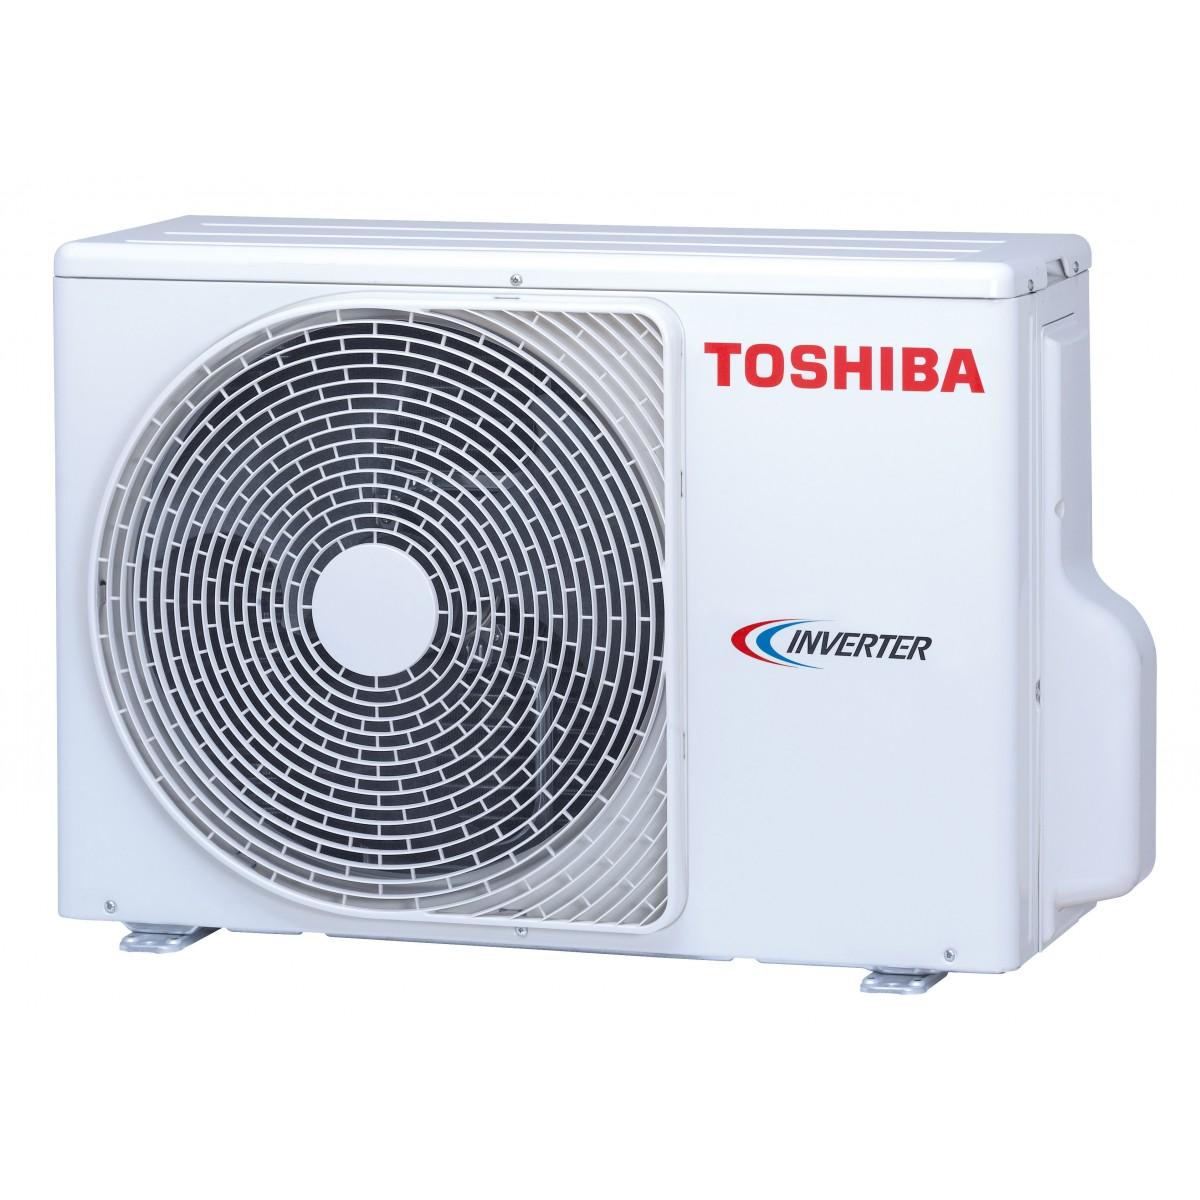 Toshiba venkovní multisplitová jednotka RAS-2M18U2AVG-E 5,2 kW